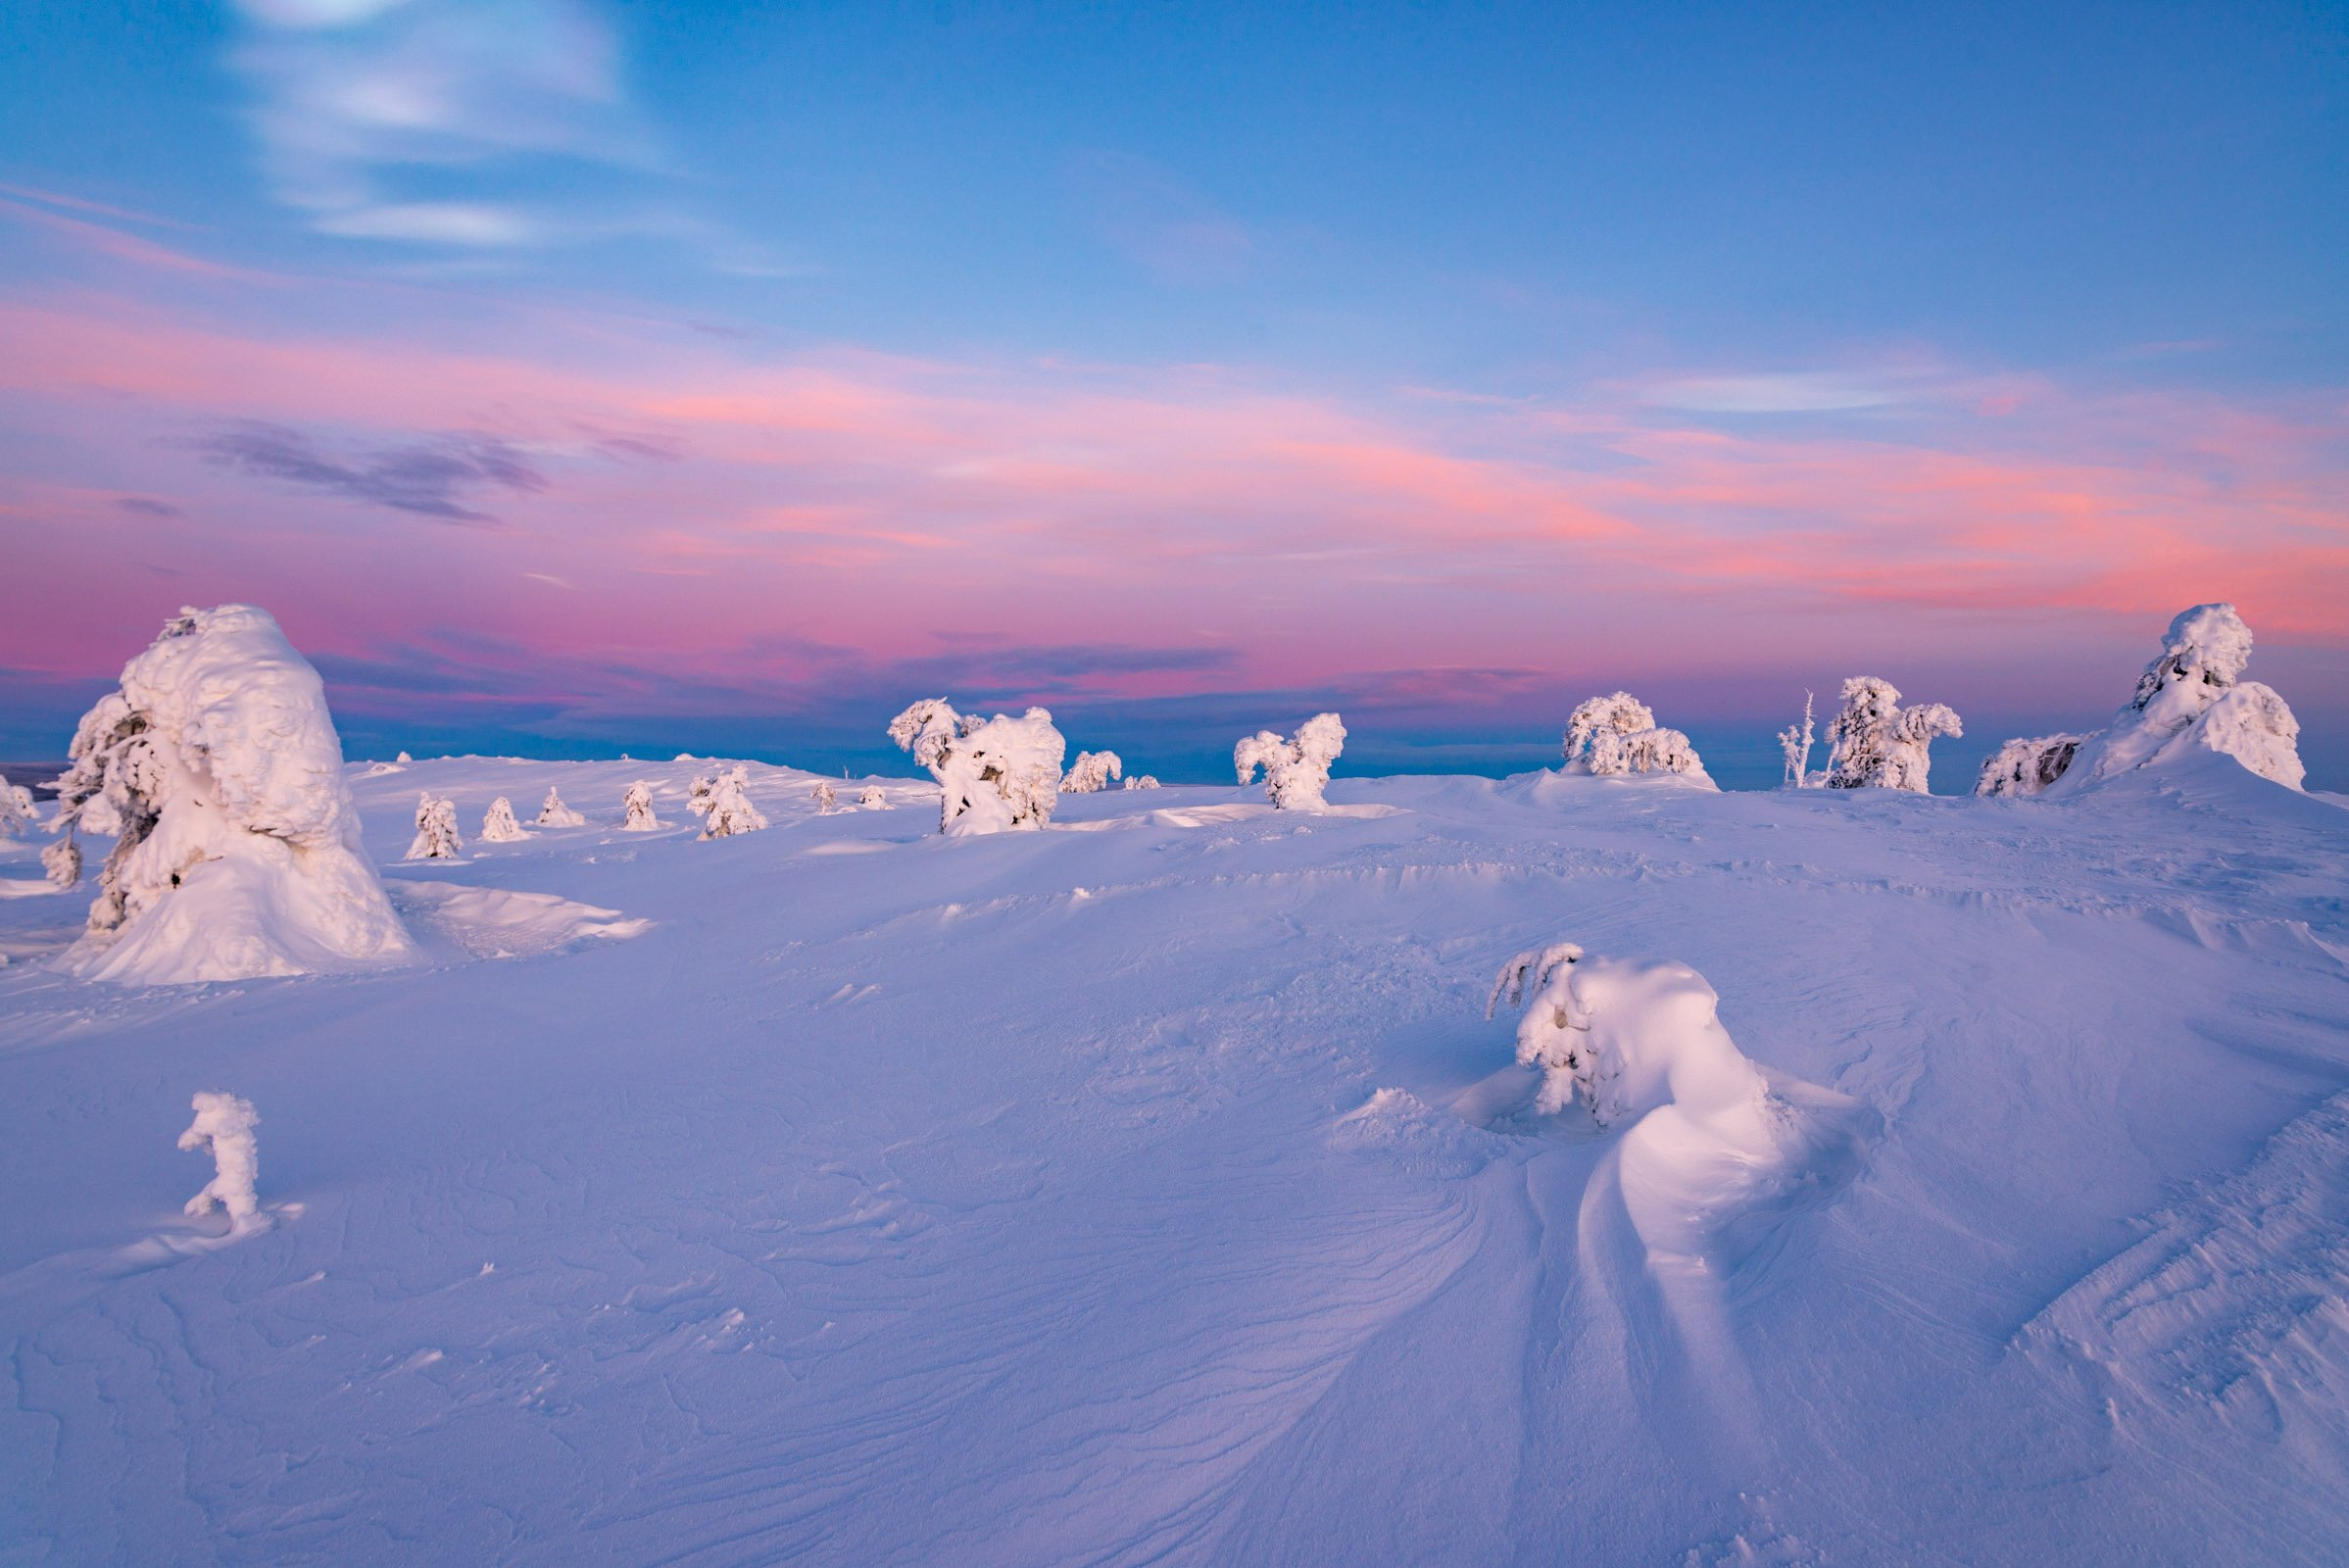 финляндия, лапландия, Исаков Дмитрий